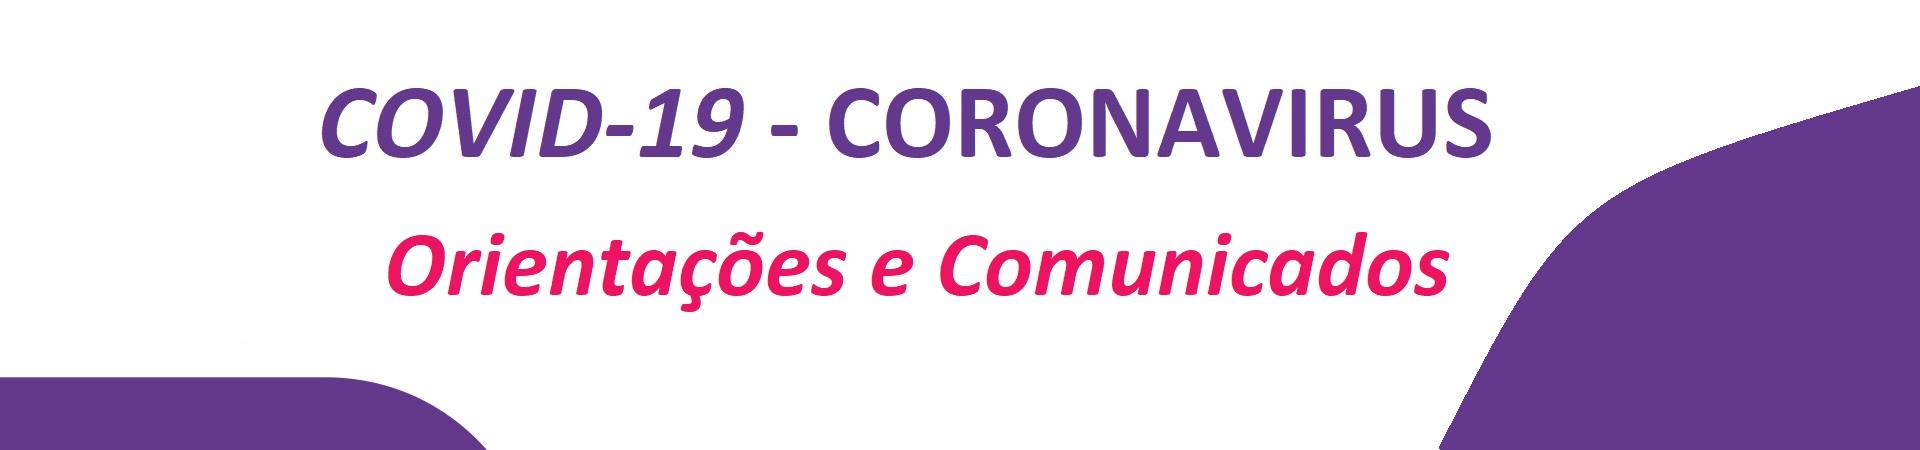 bannerCorona